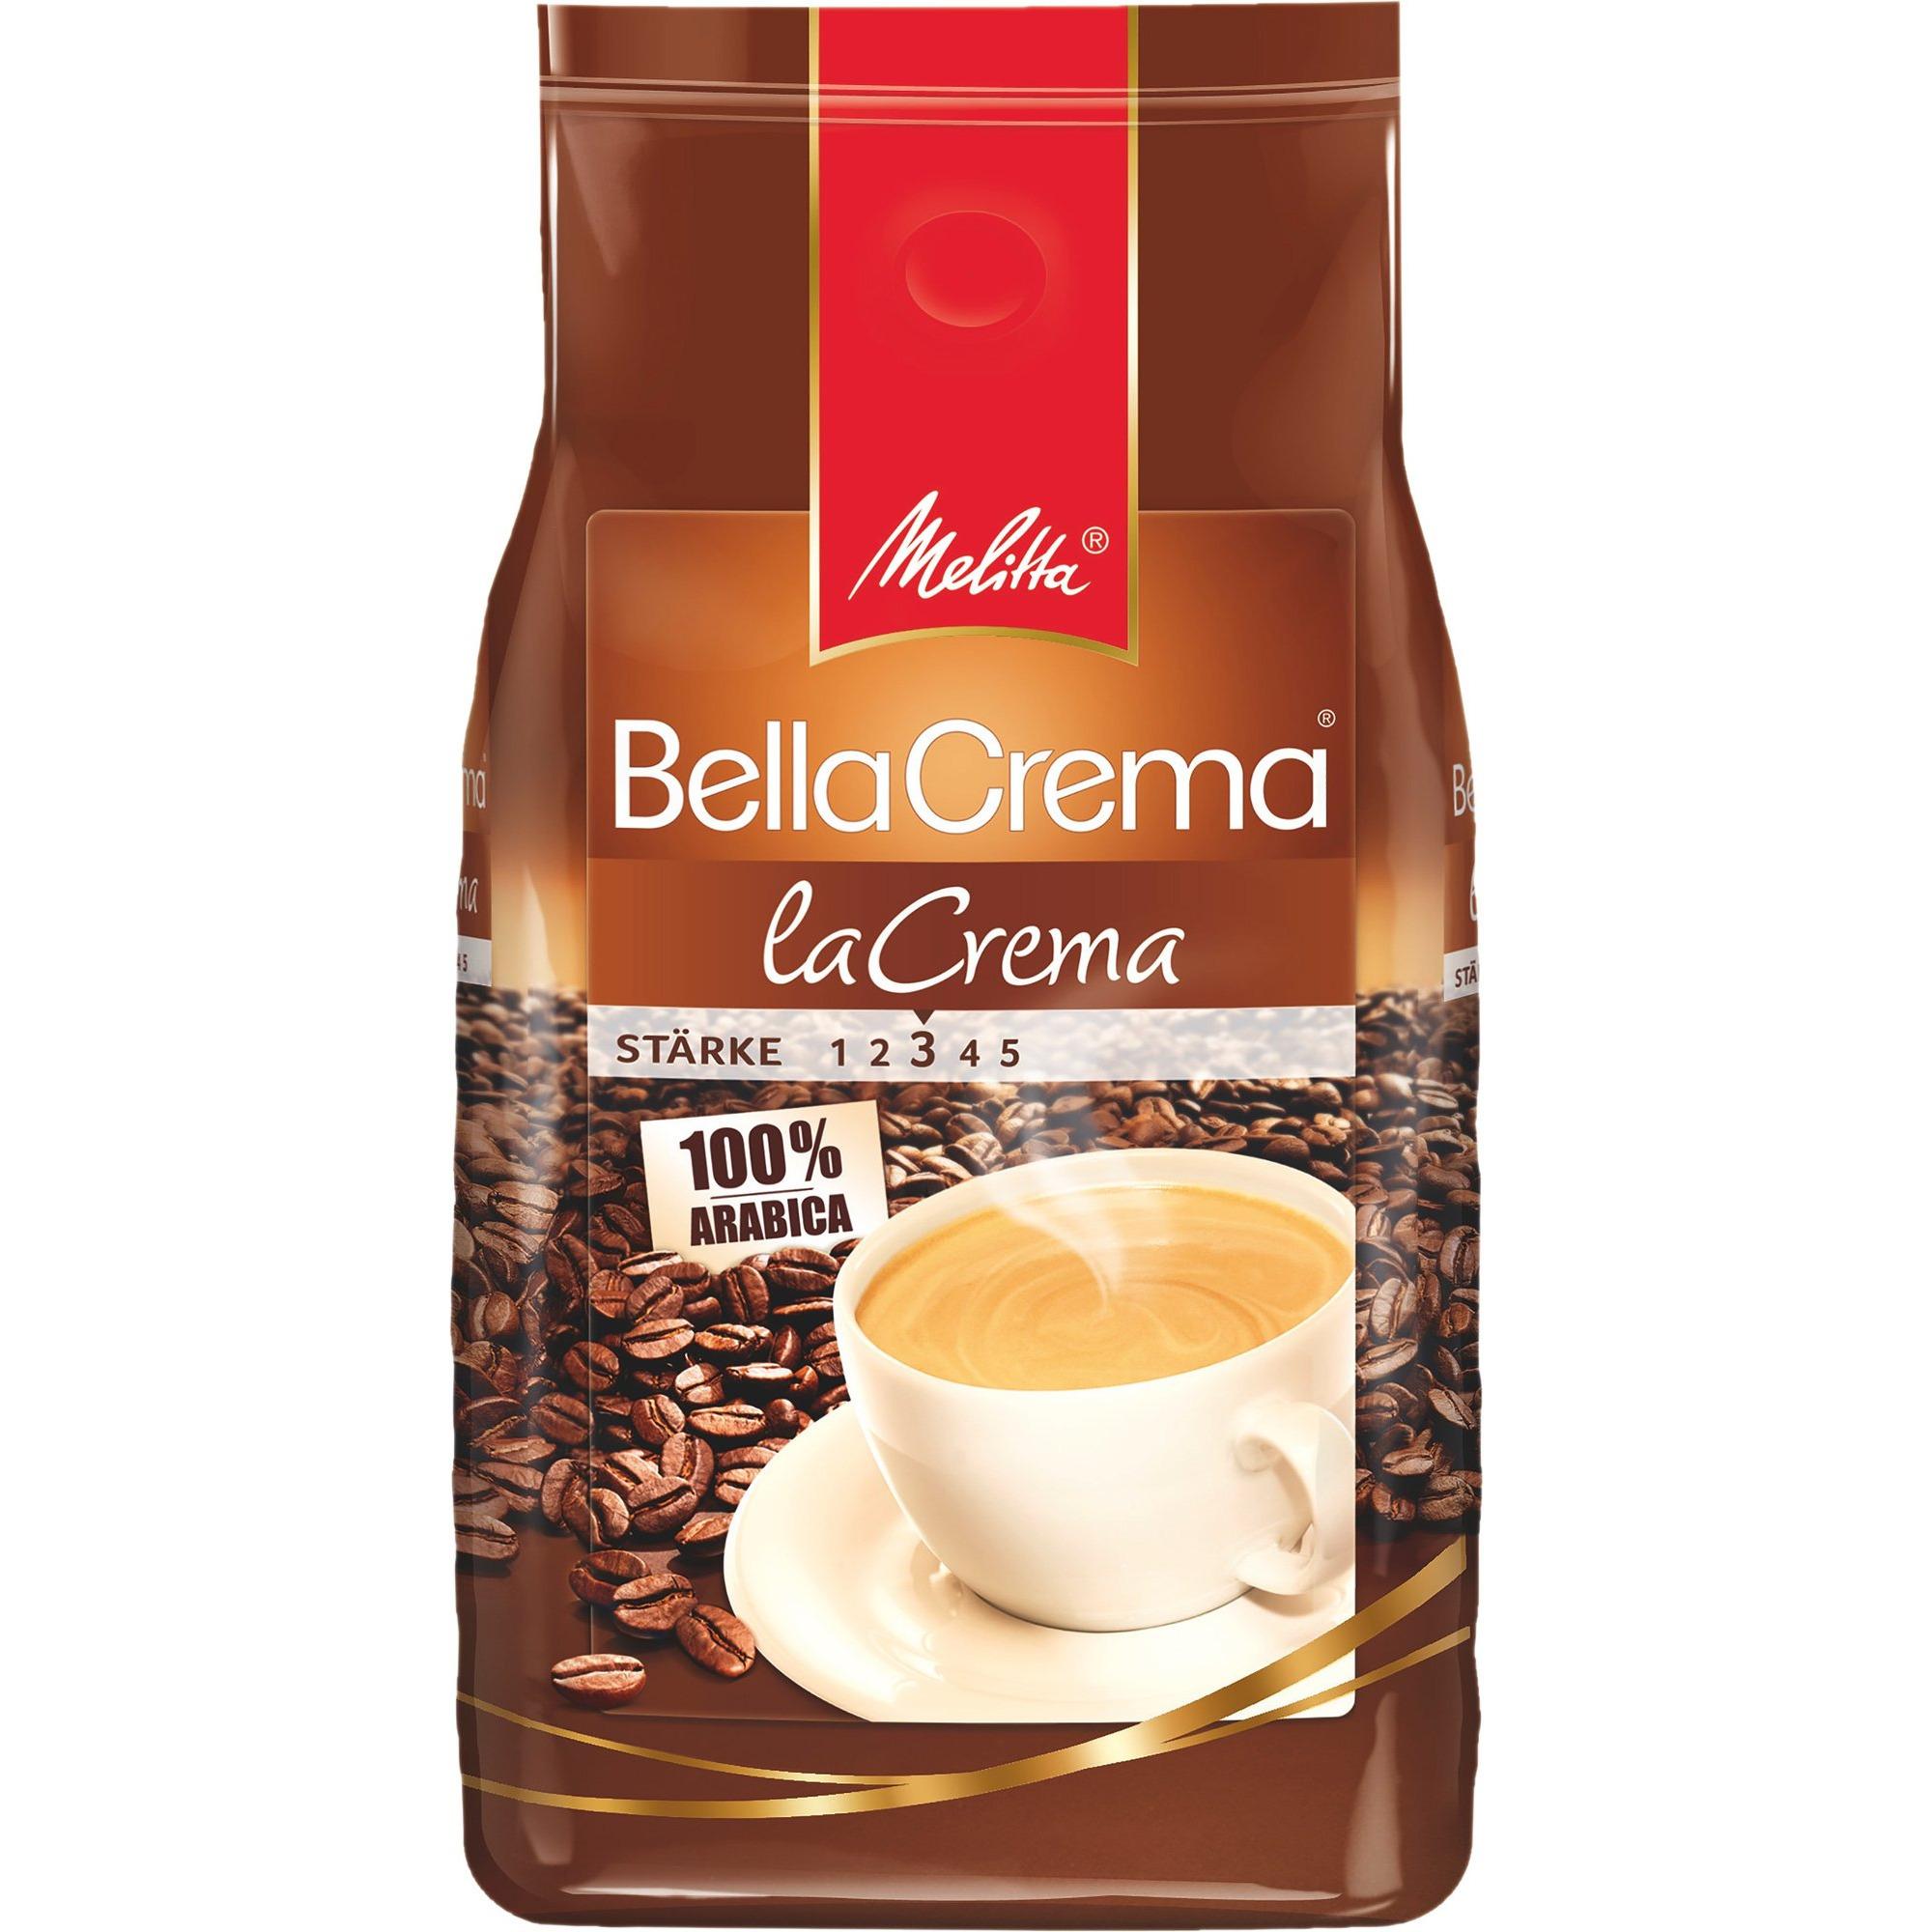 Melitta BellaCrema kaffebönor LaCrema